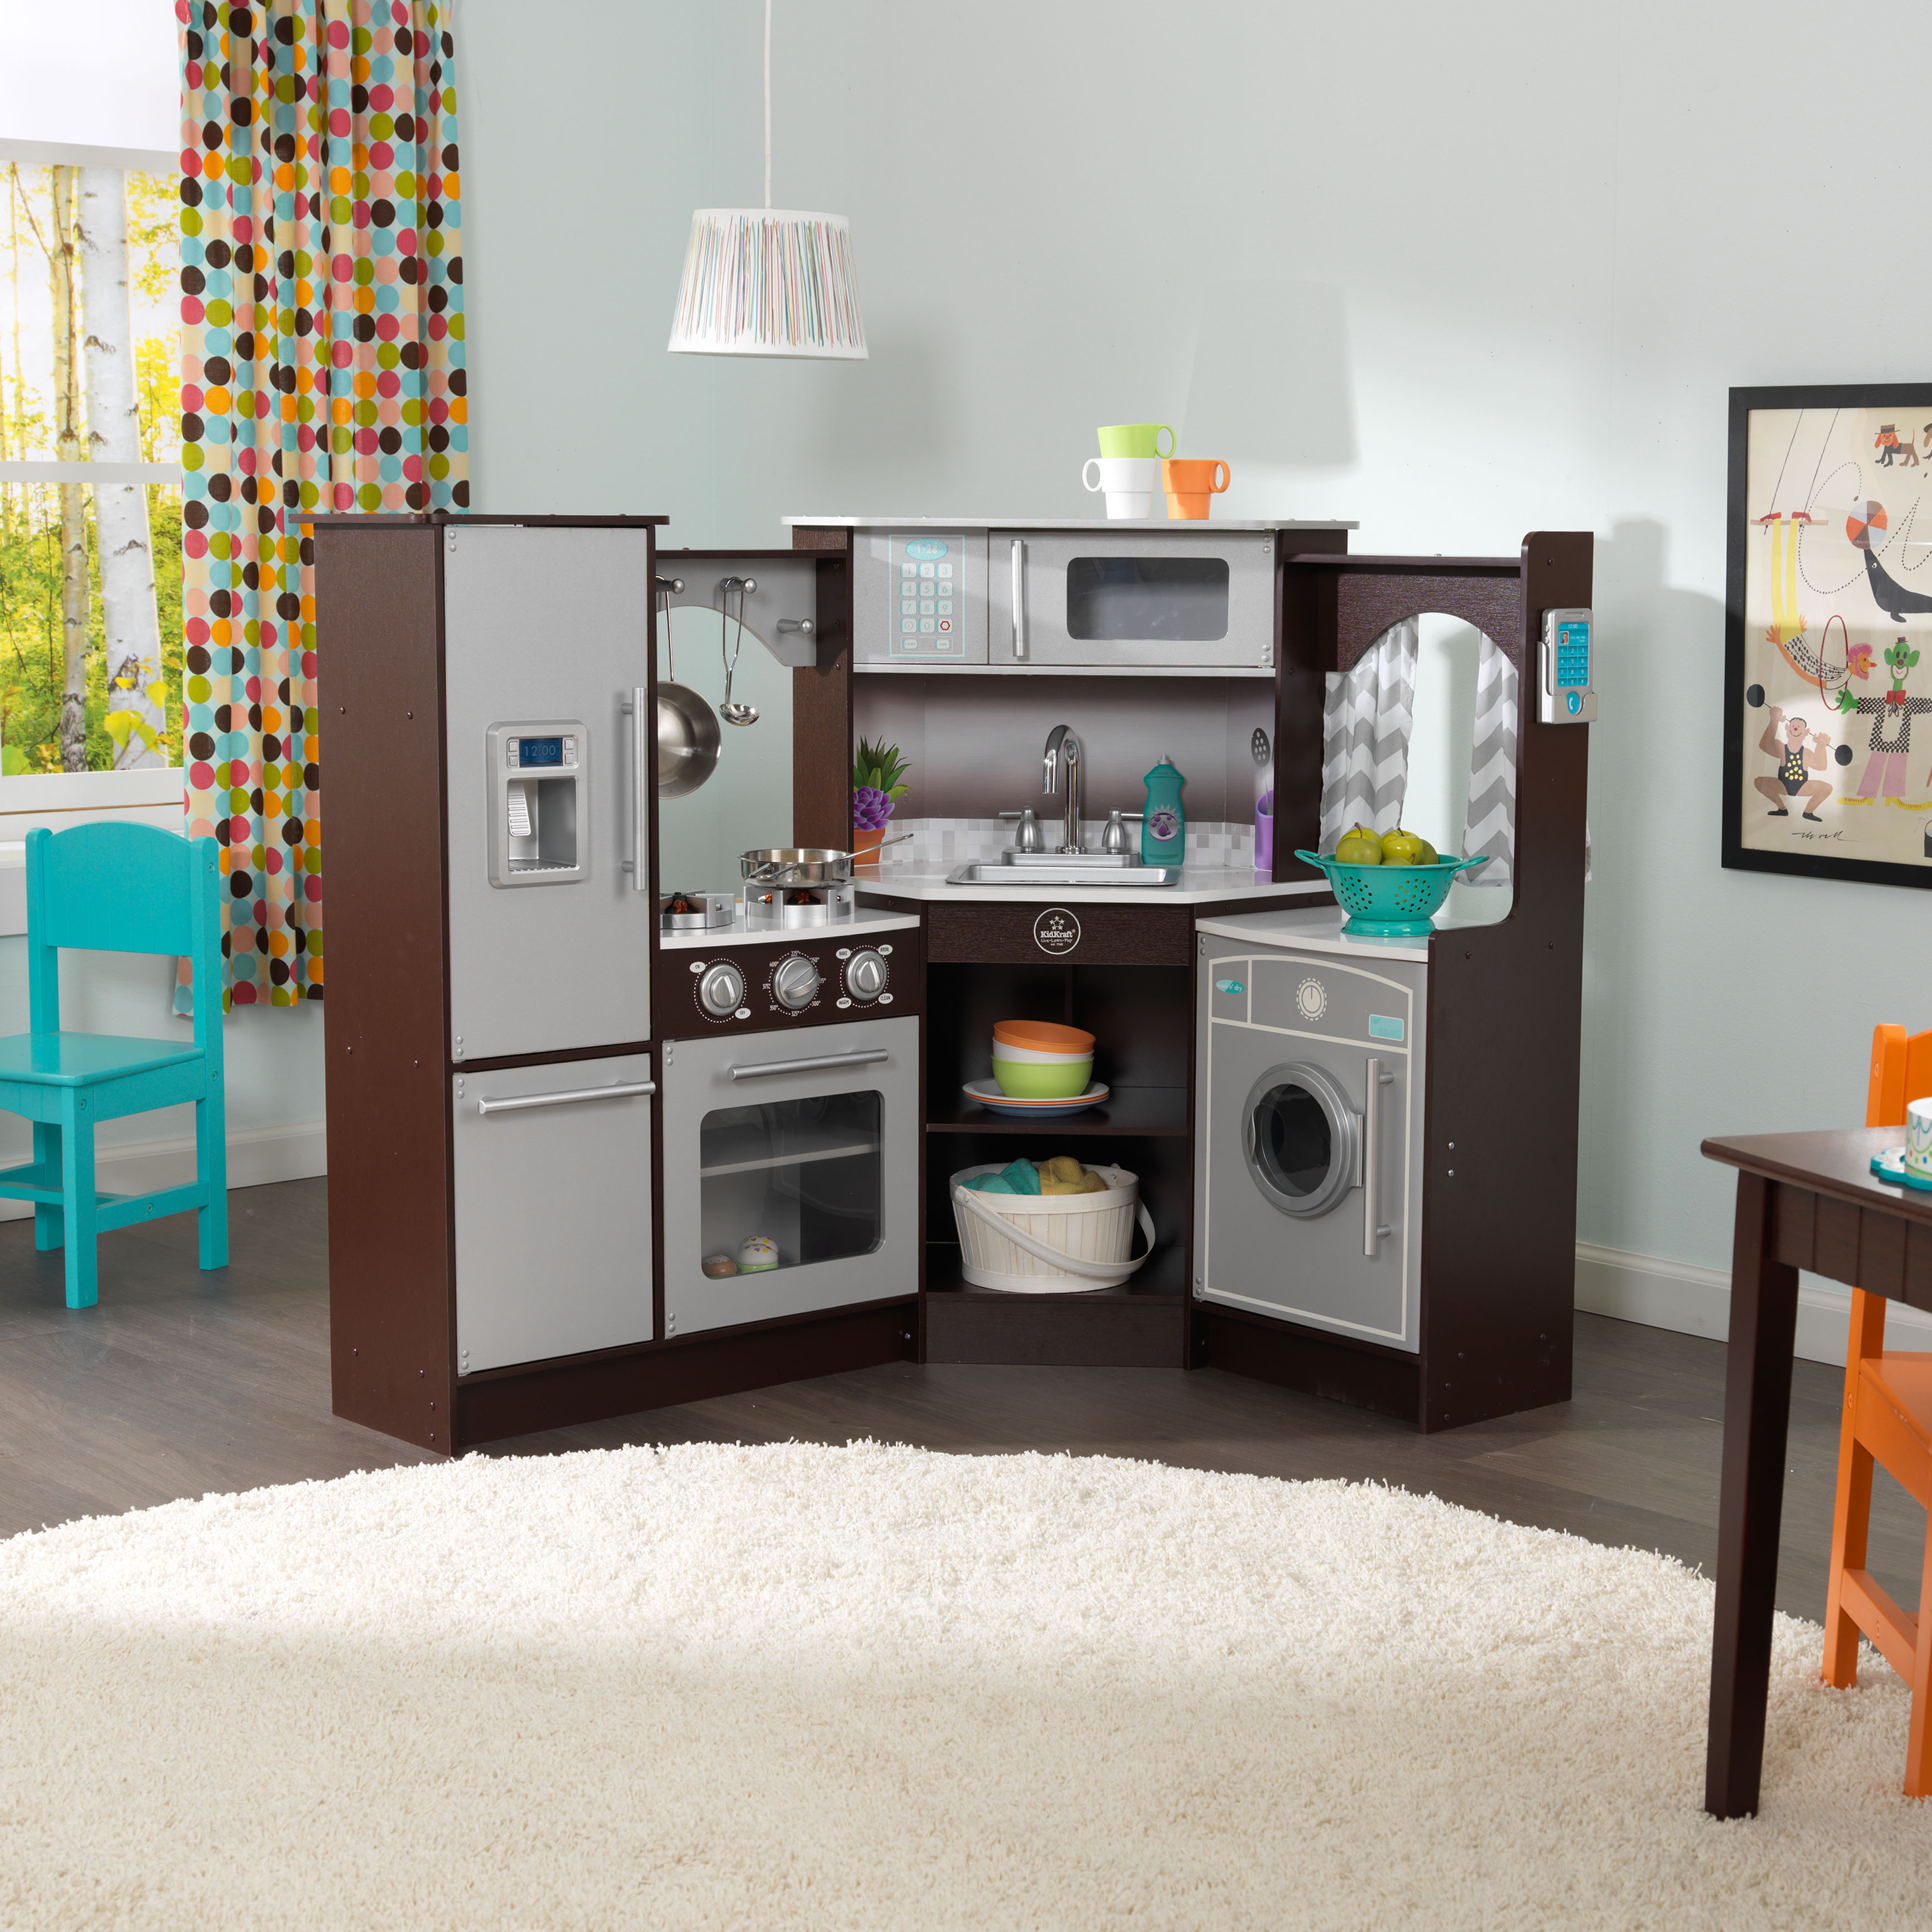 KidKraft Ultimate Corner Play Kitchen with Lights & Sounds ...